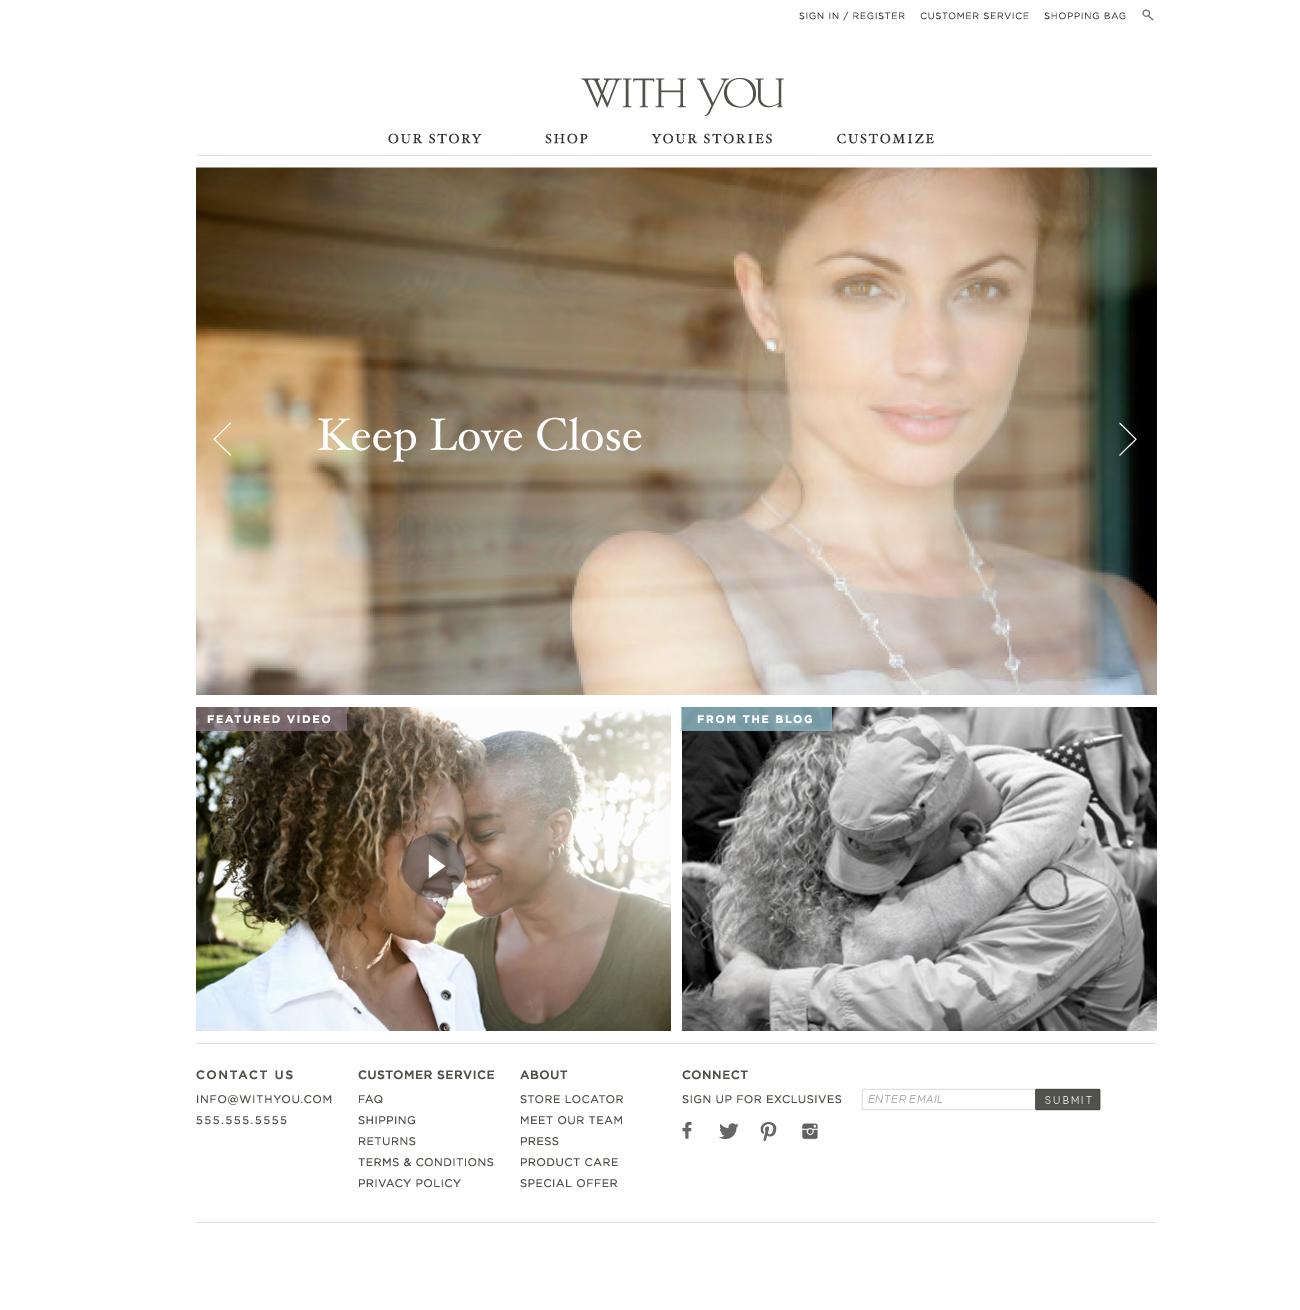 WY_Website_V2.jpg